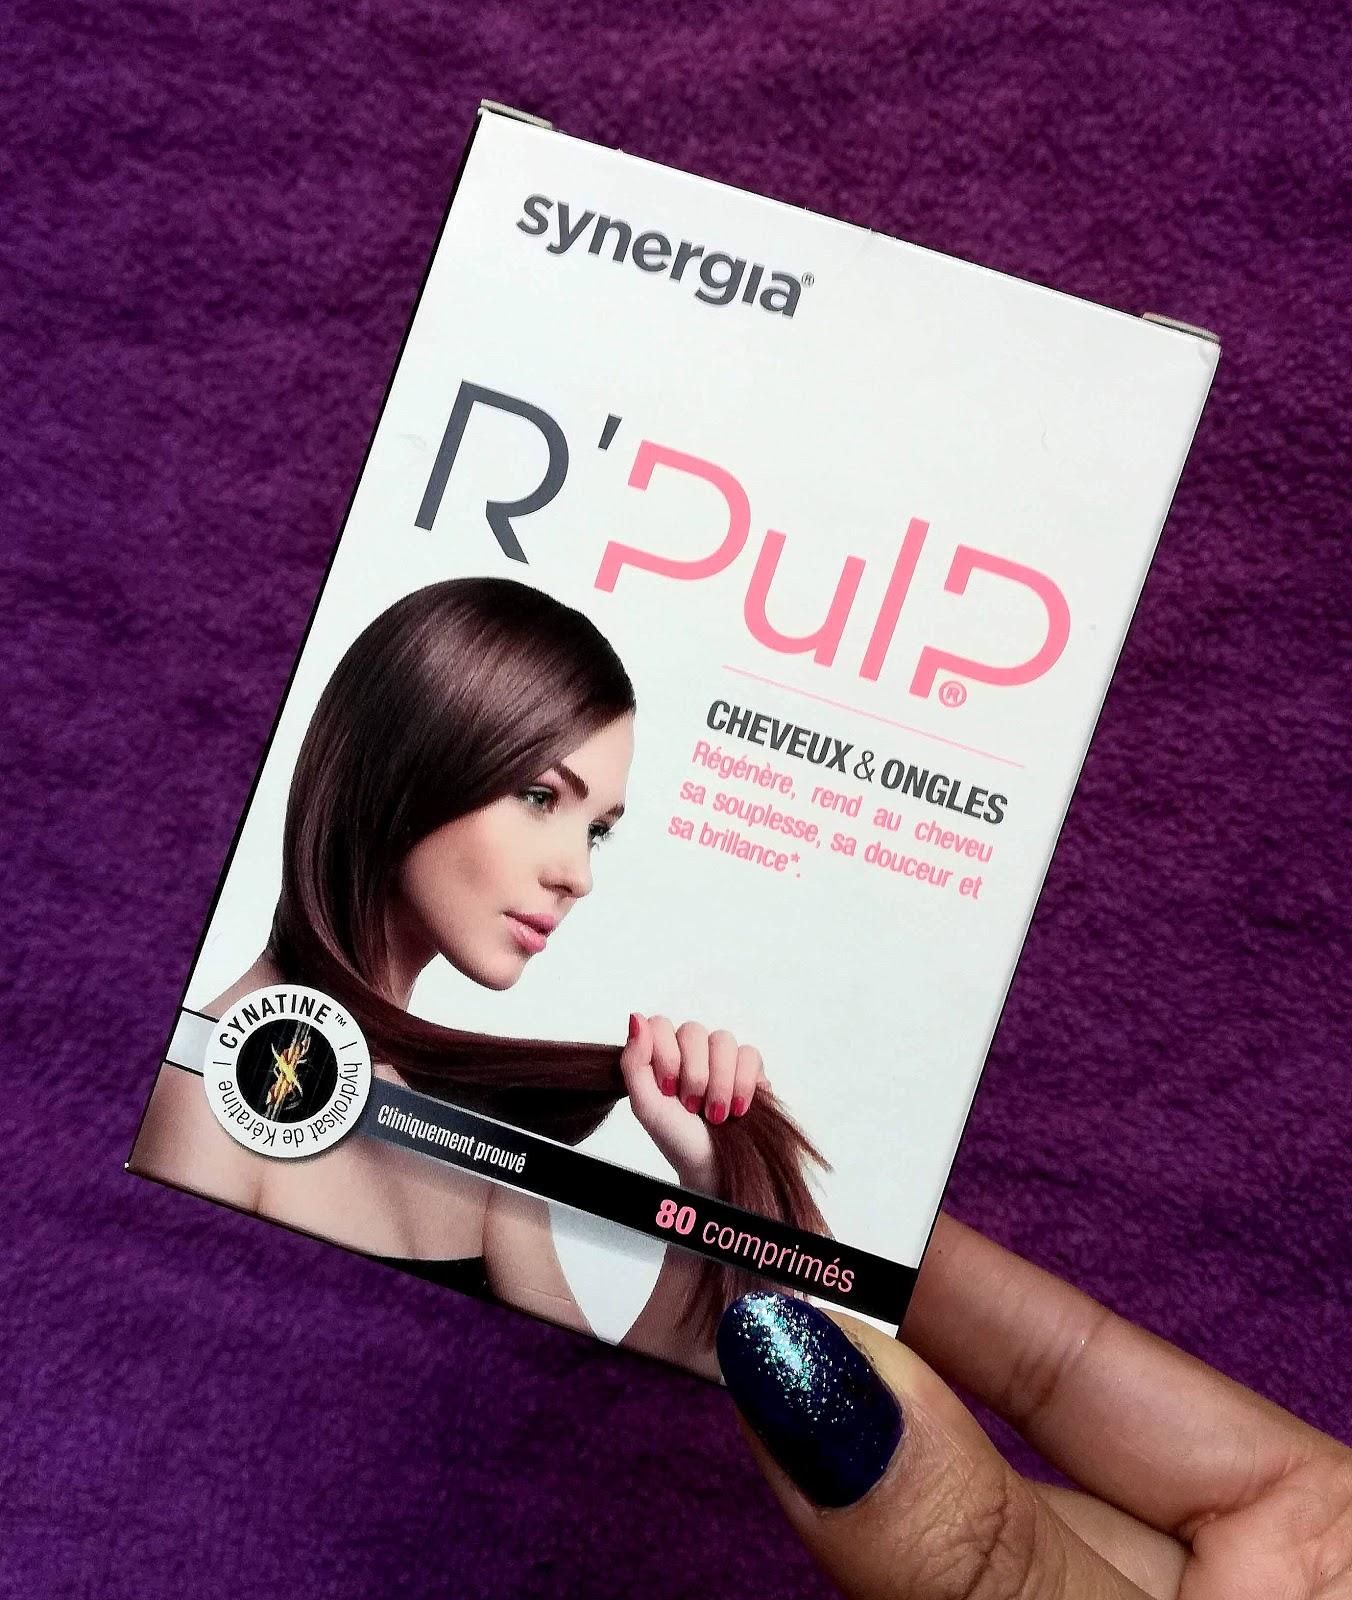 R'Pulp Cheveux et ongles Laboratoire Synergia